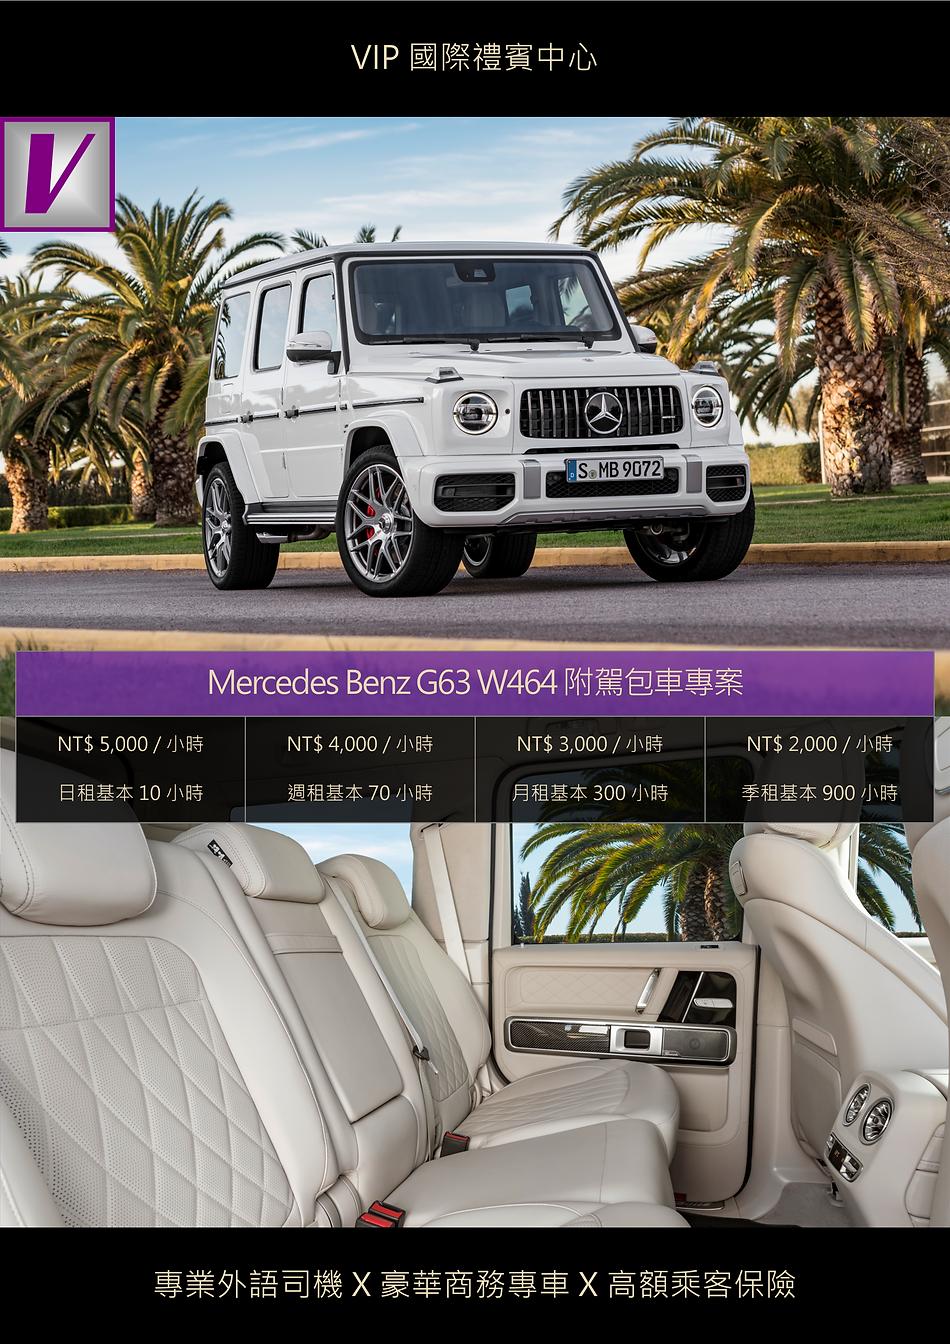 VIP國際禮賓中心 MERCEDES BENZ G63 W464 附駕包車專案 DM.png